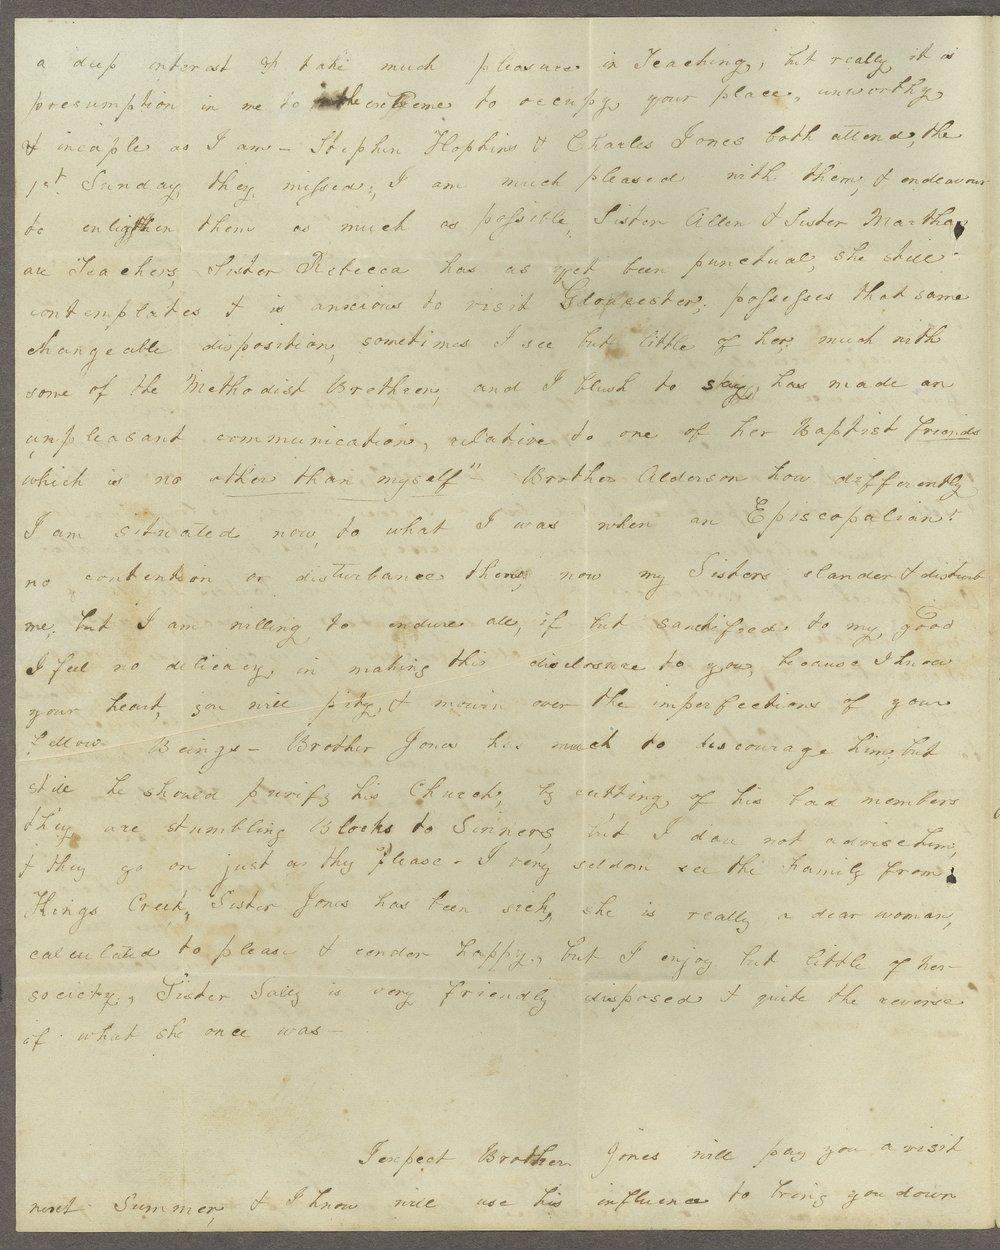 Louisa E. White to Lewis Allen Alderson - 2